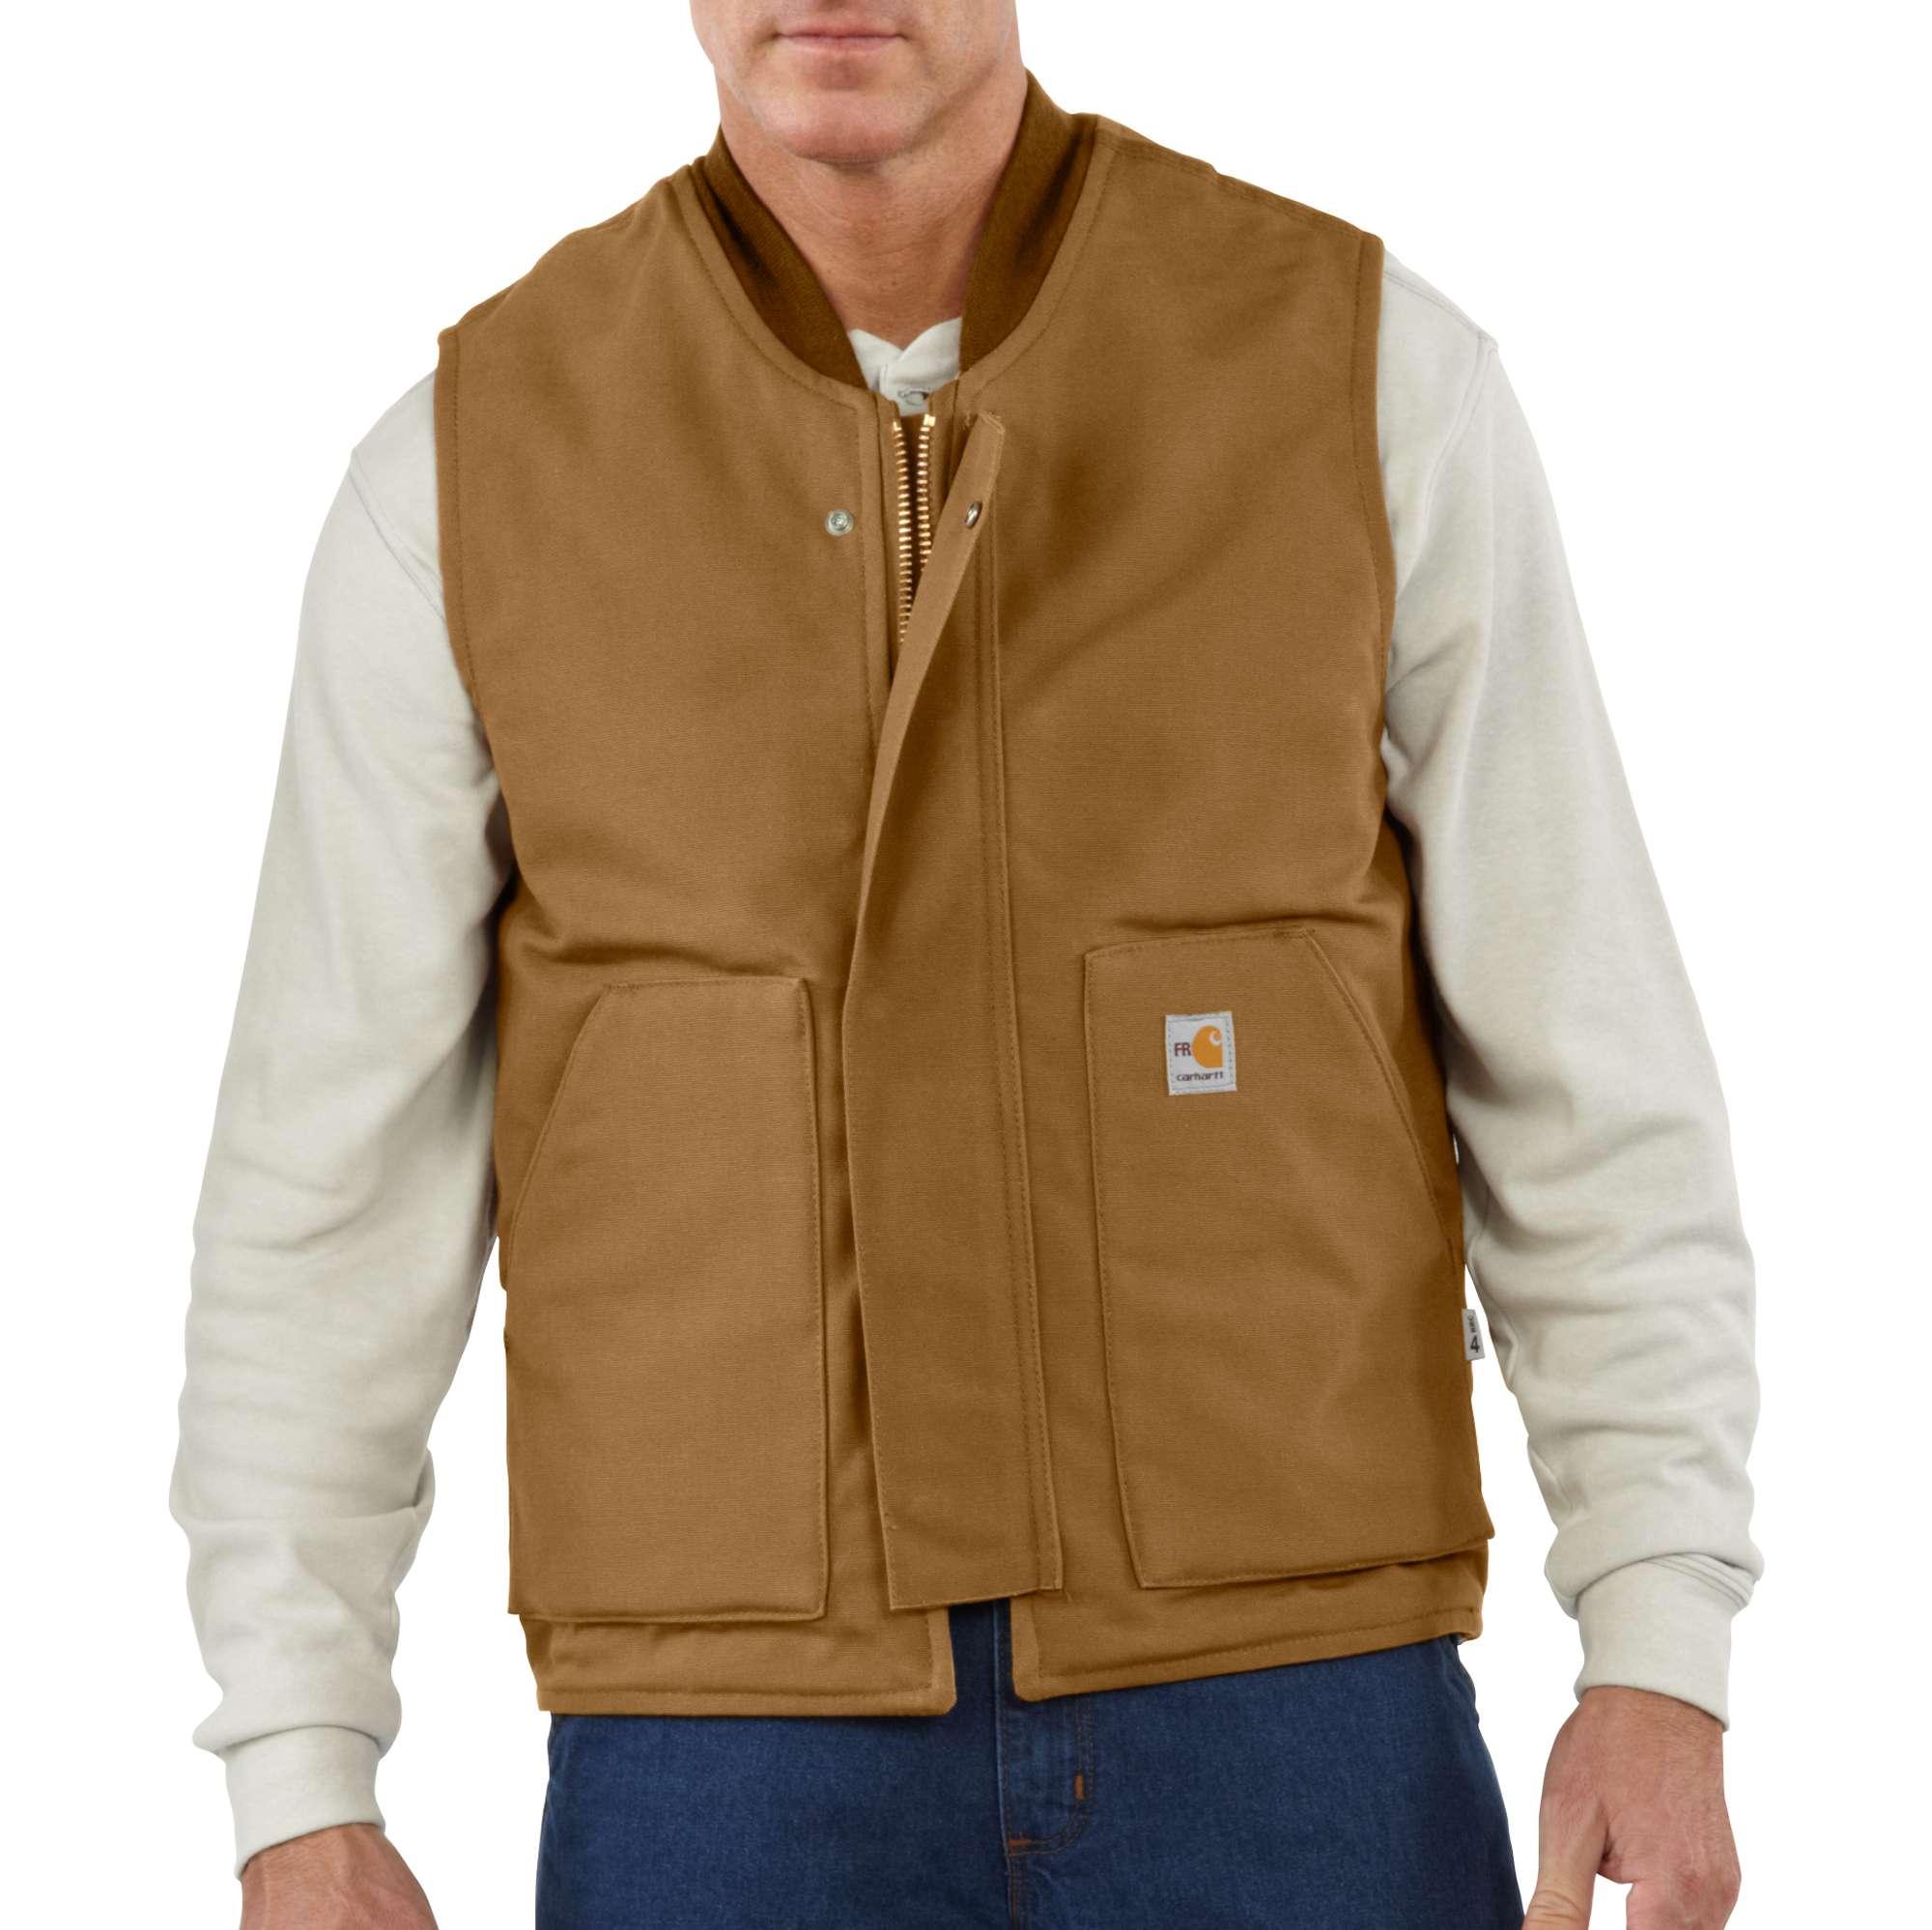 Carhartt Flame-resistant Duck Vest/quilt Lined Carhartt Brown SM